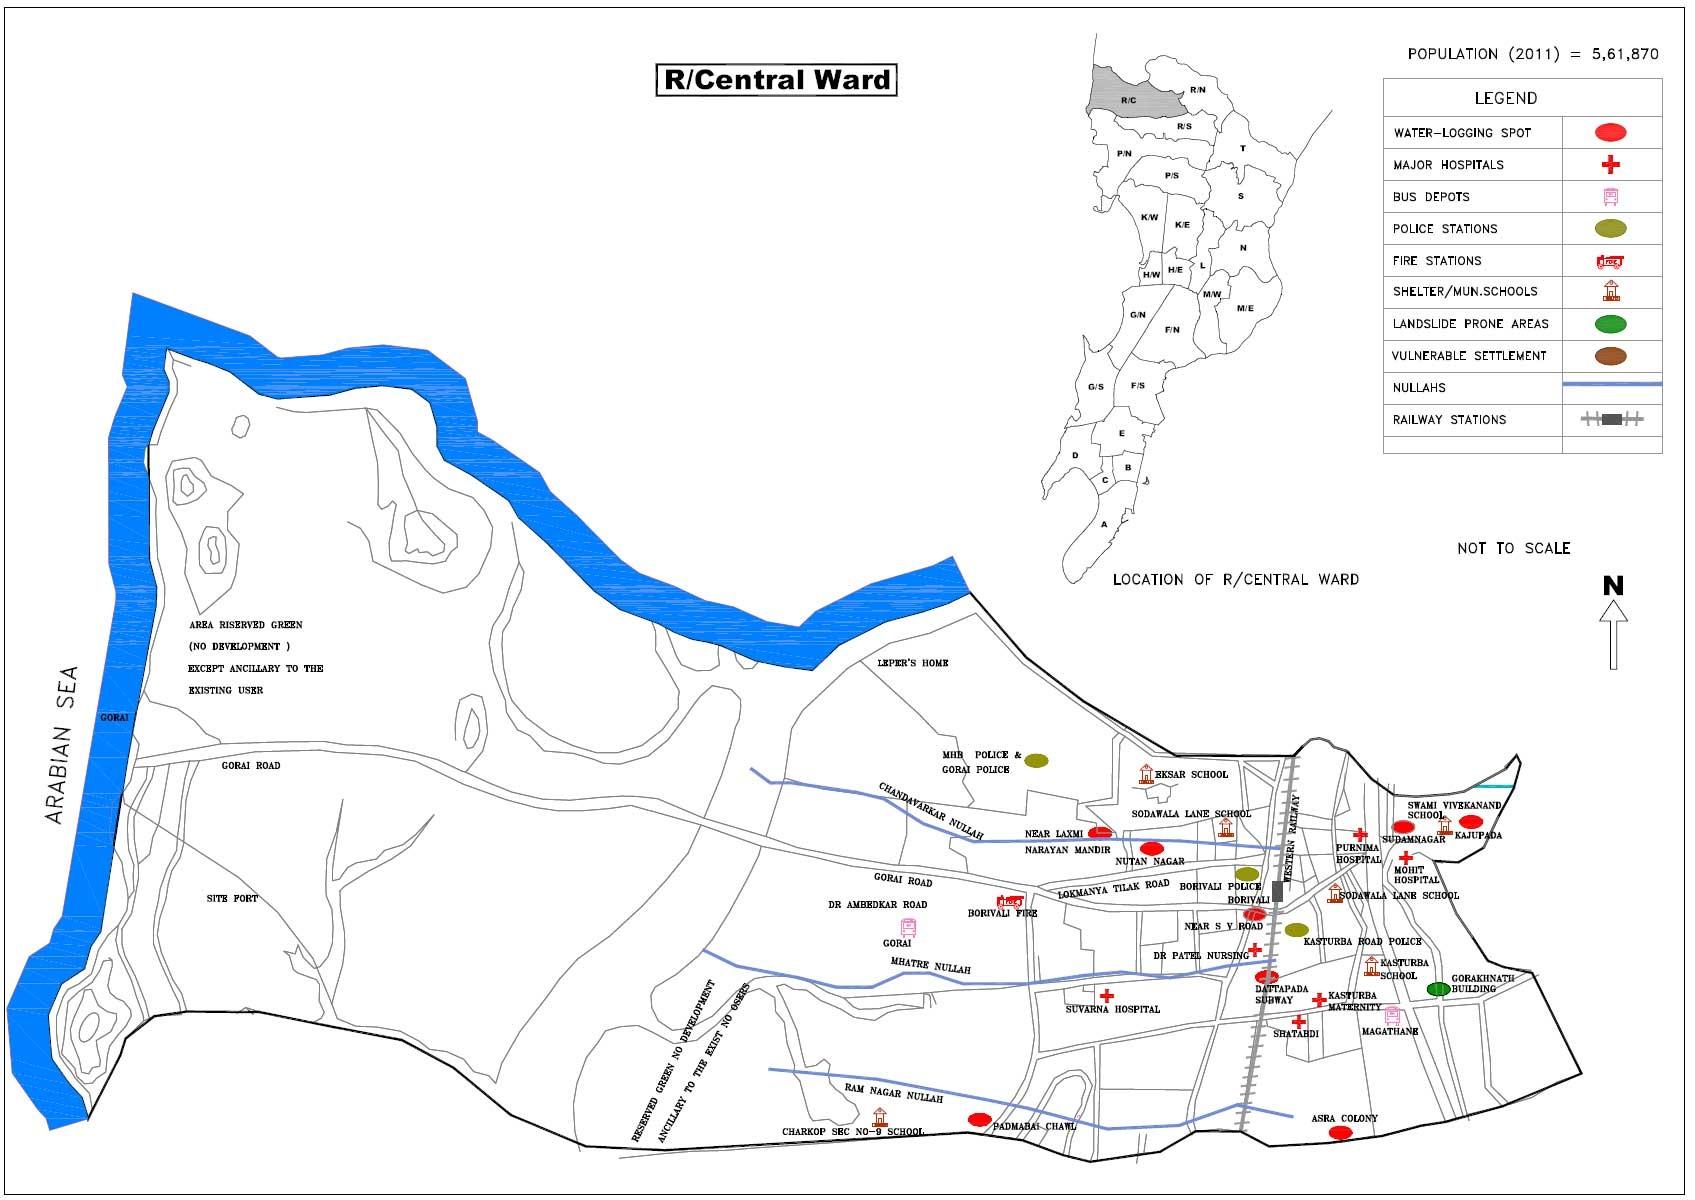 R - Central ward